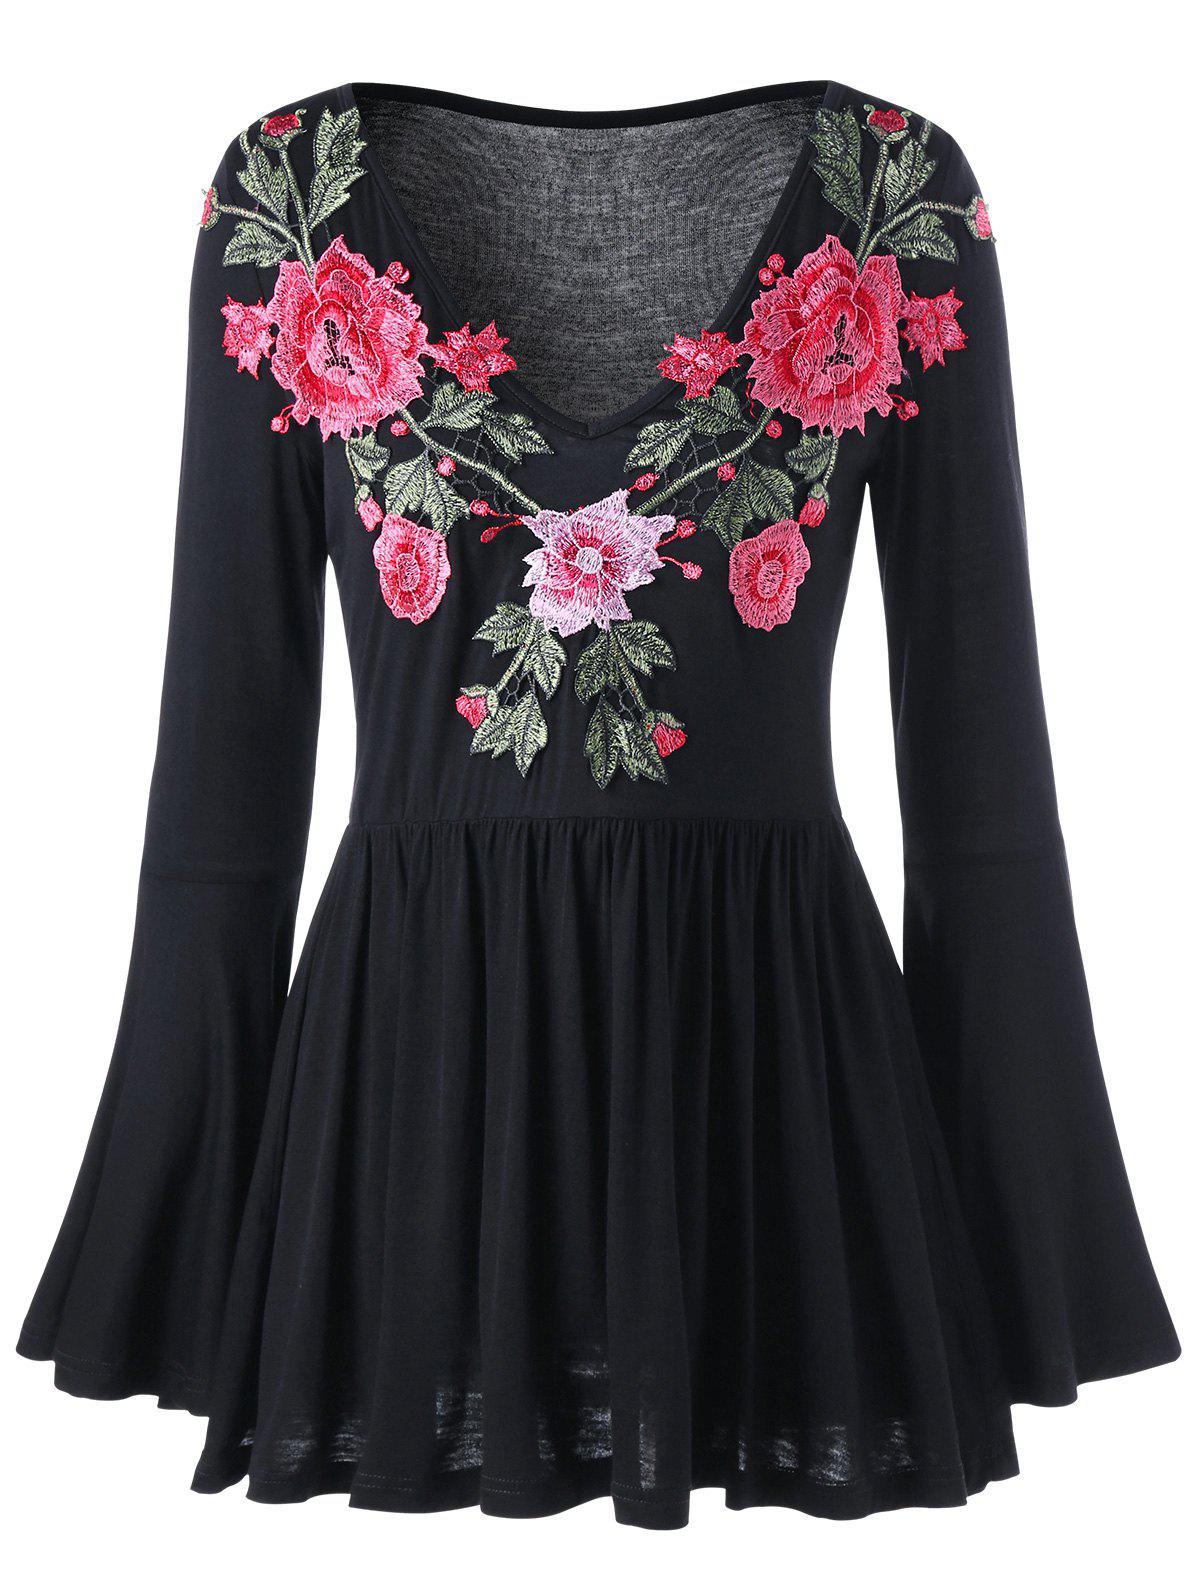 Glockenhlse Blumengestickte Peplum Bluse